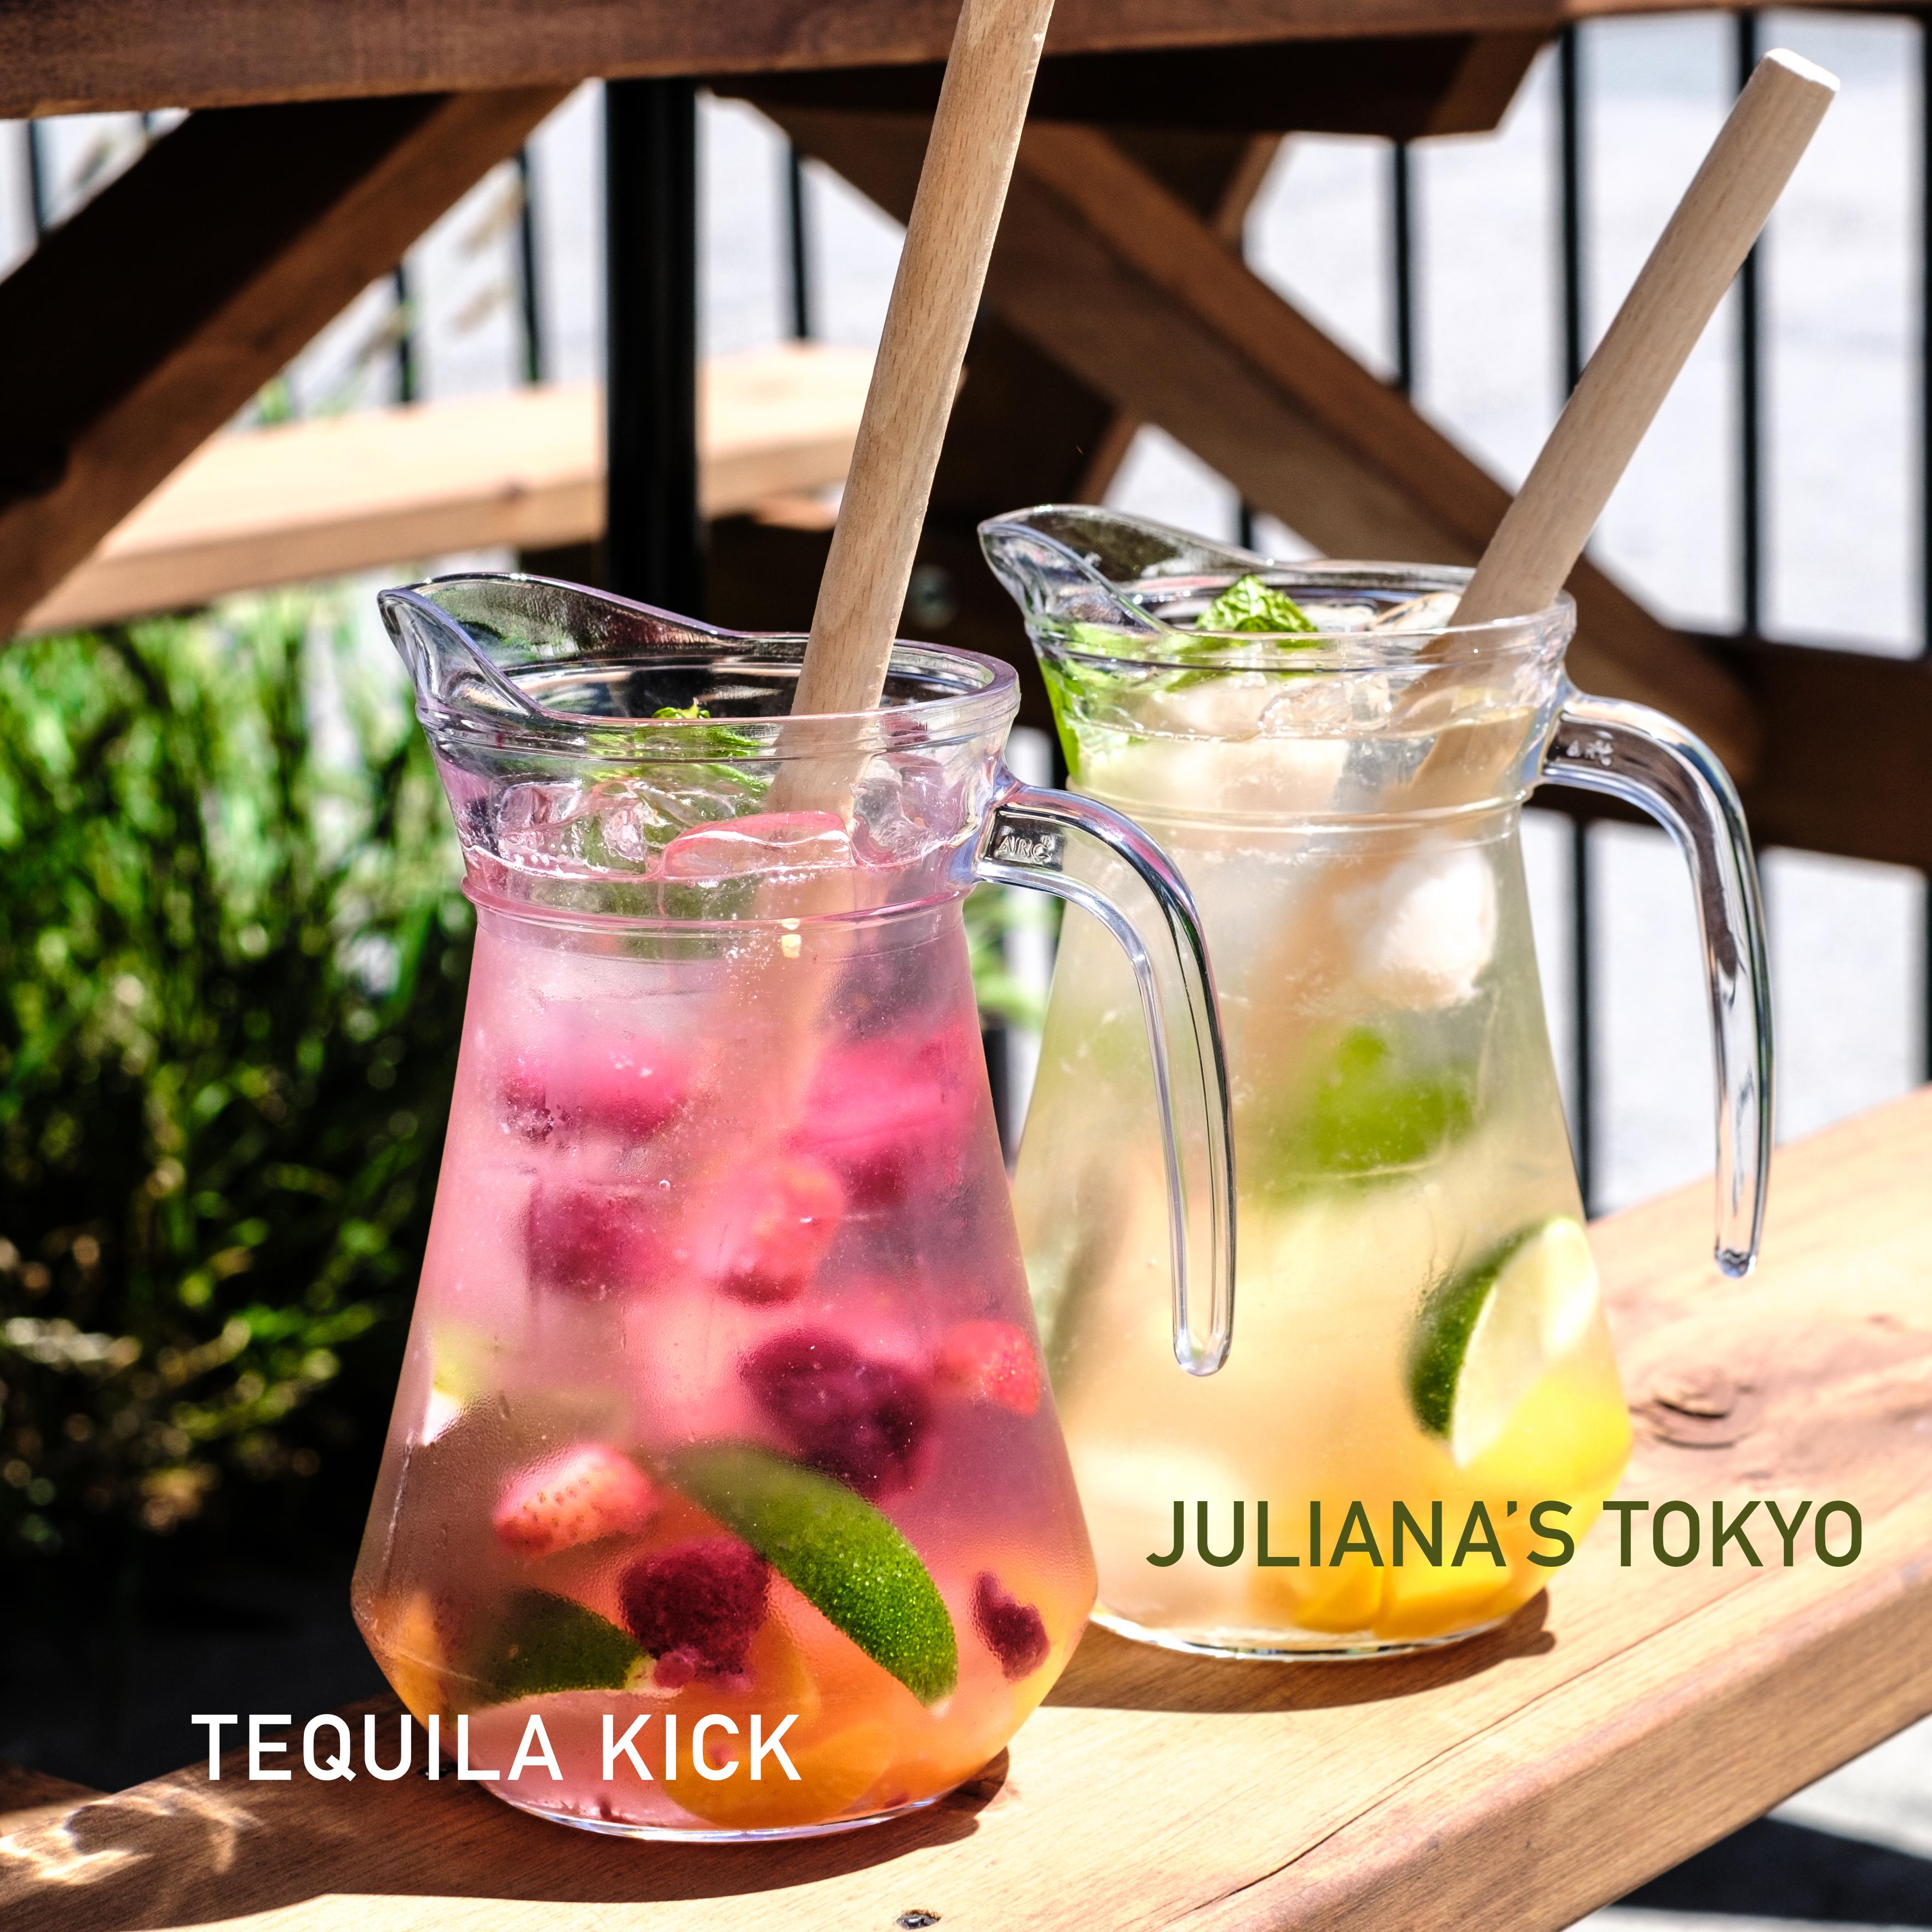 Juliana's Tokyo & Tequila Kick